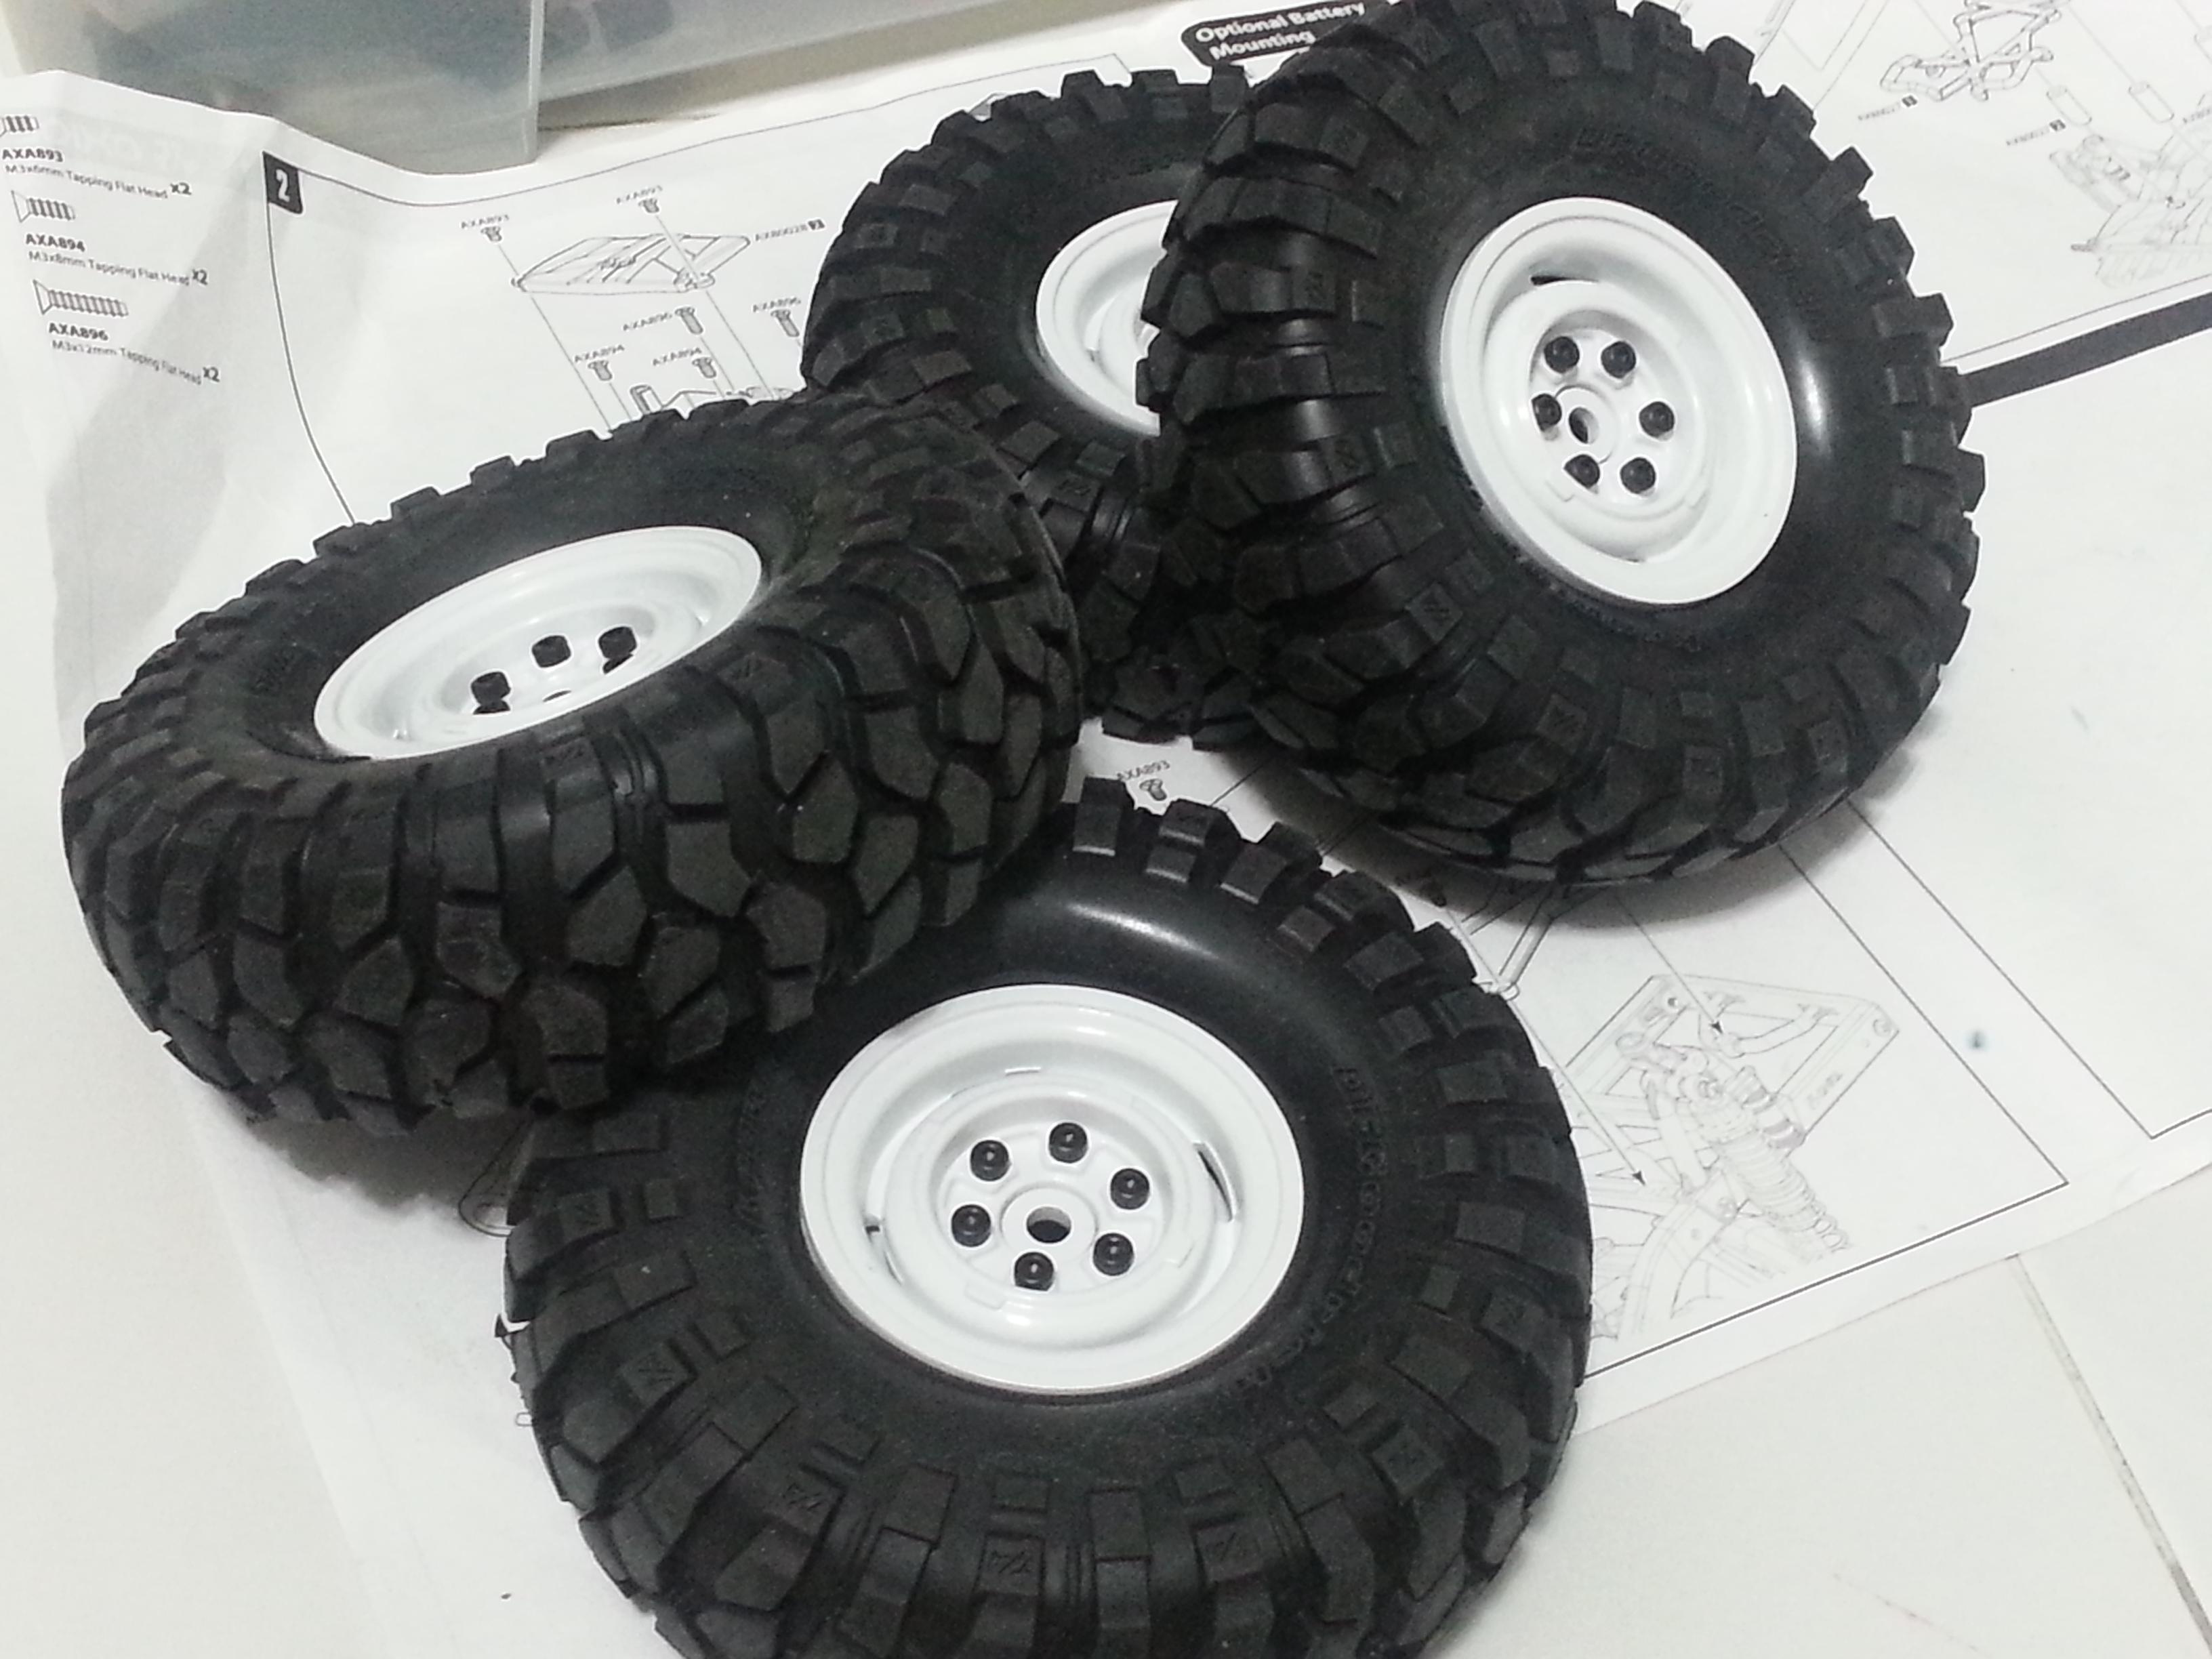 build - Babyboy's first 6x6 build 15588880908_7618ea5728_o